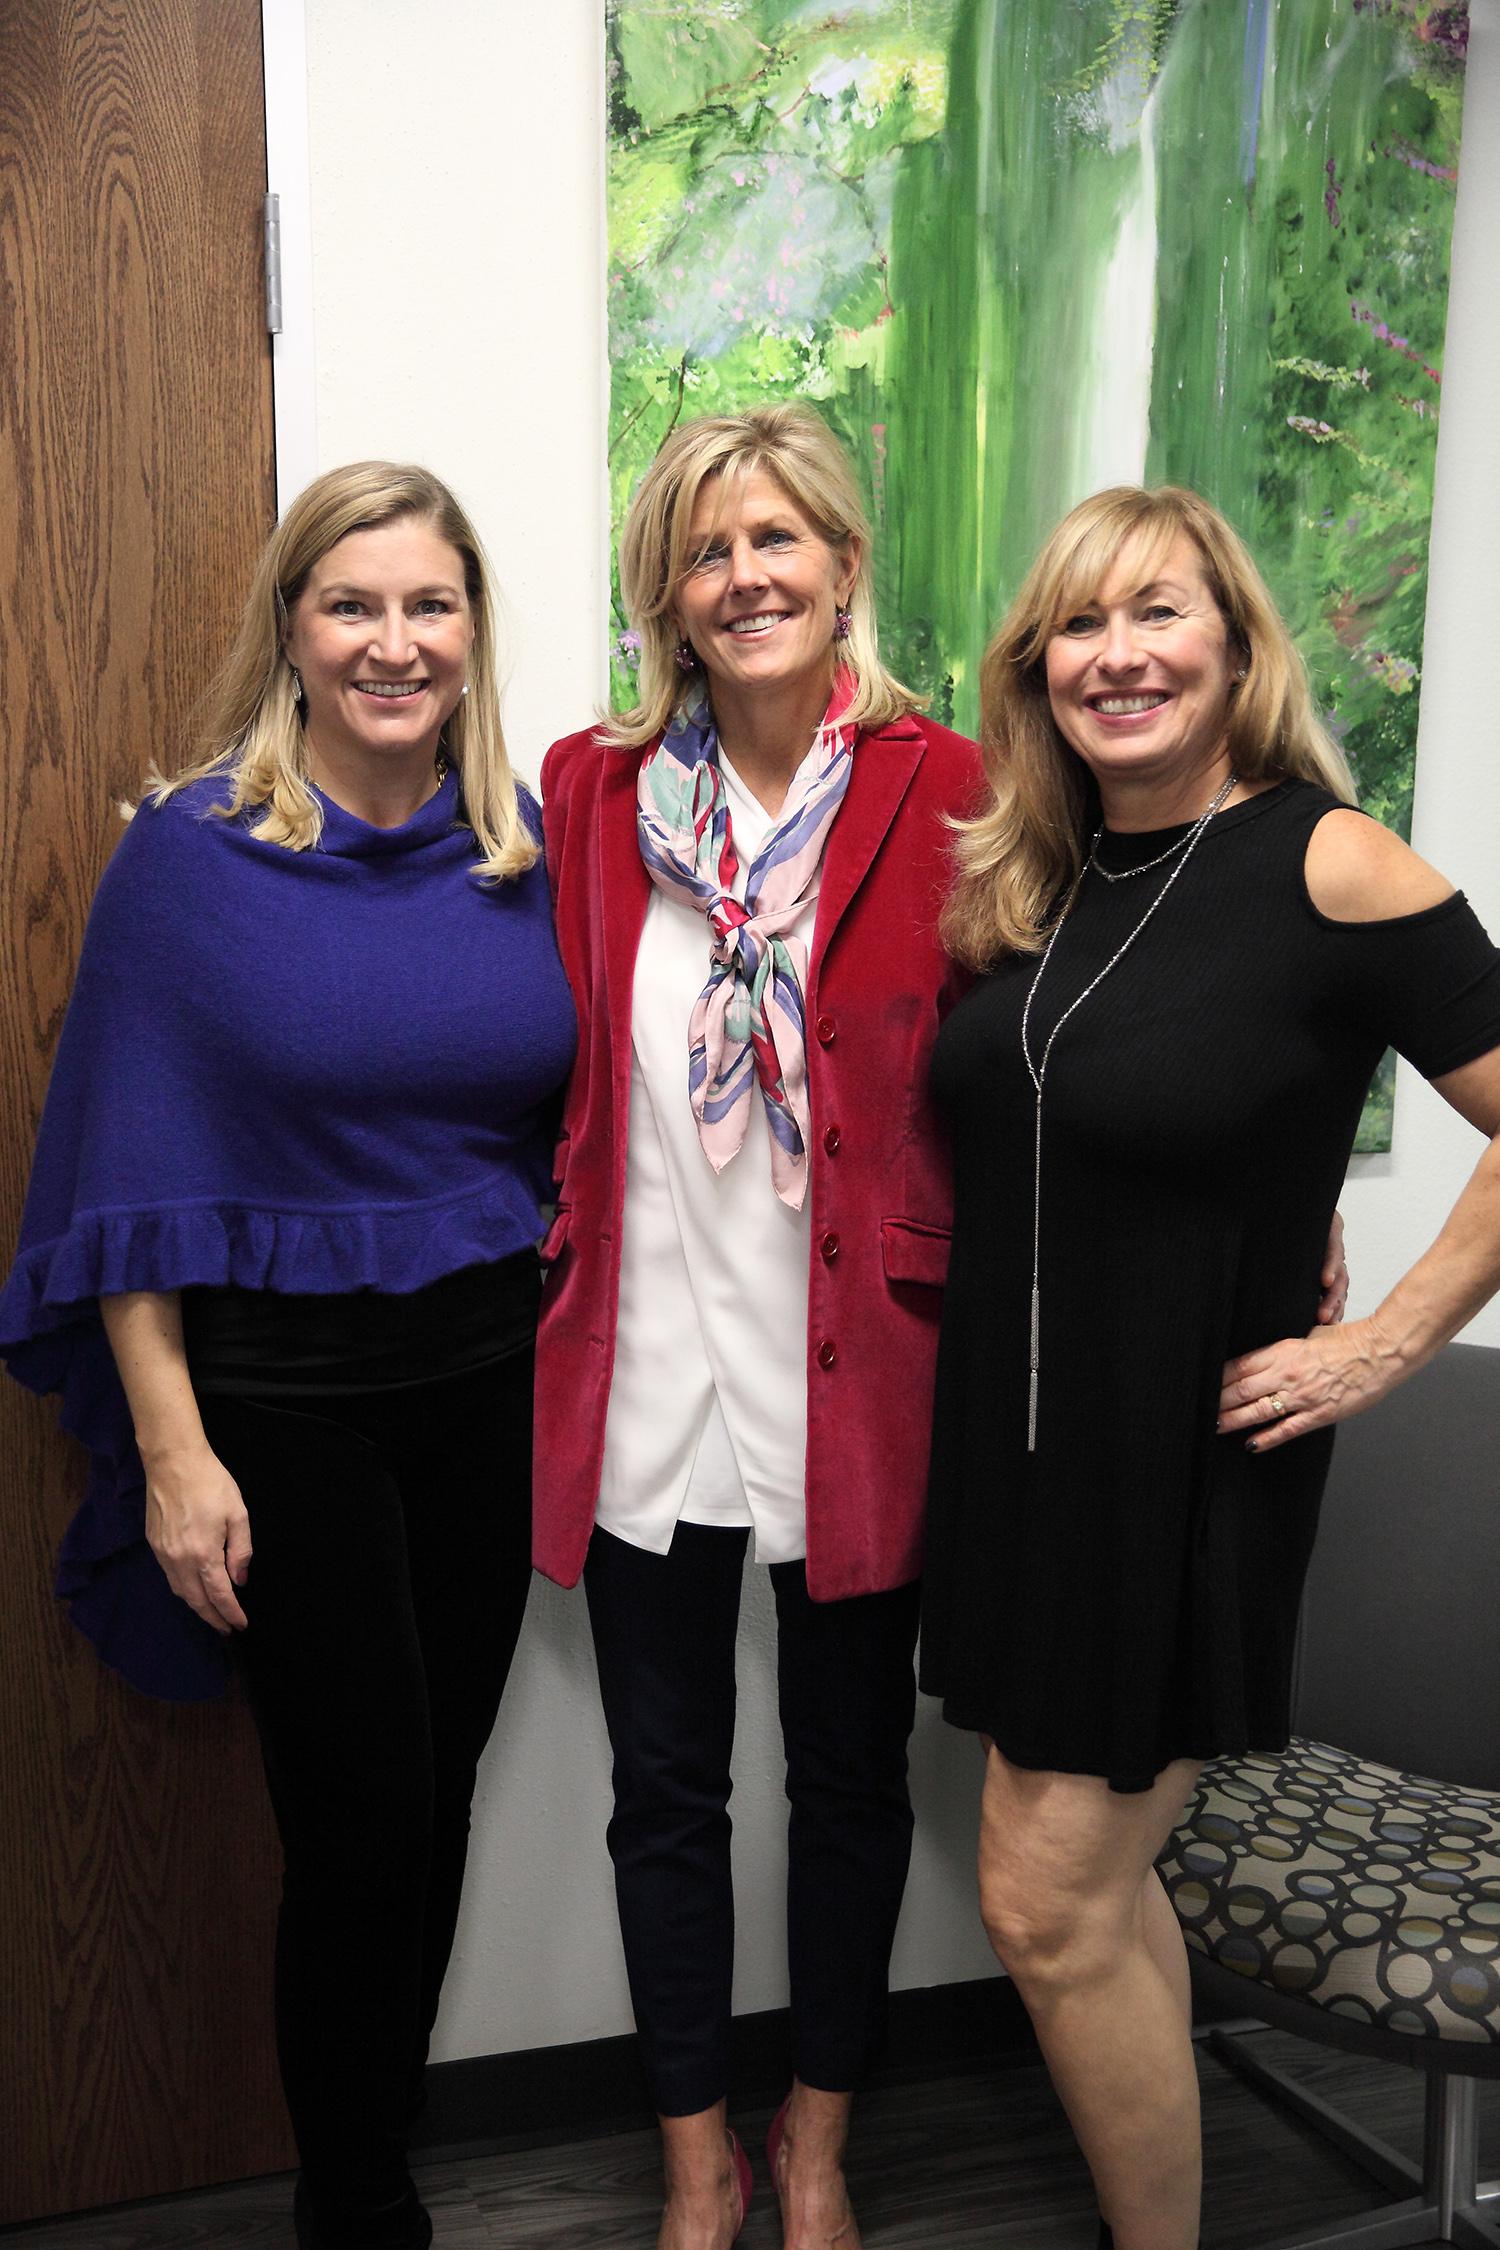 Lori Tisinai, Heidi Prom, and Debbie Pickus